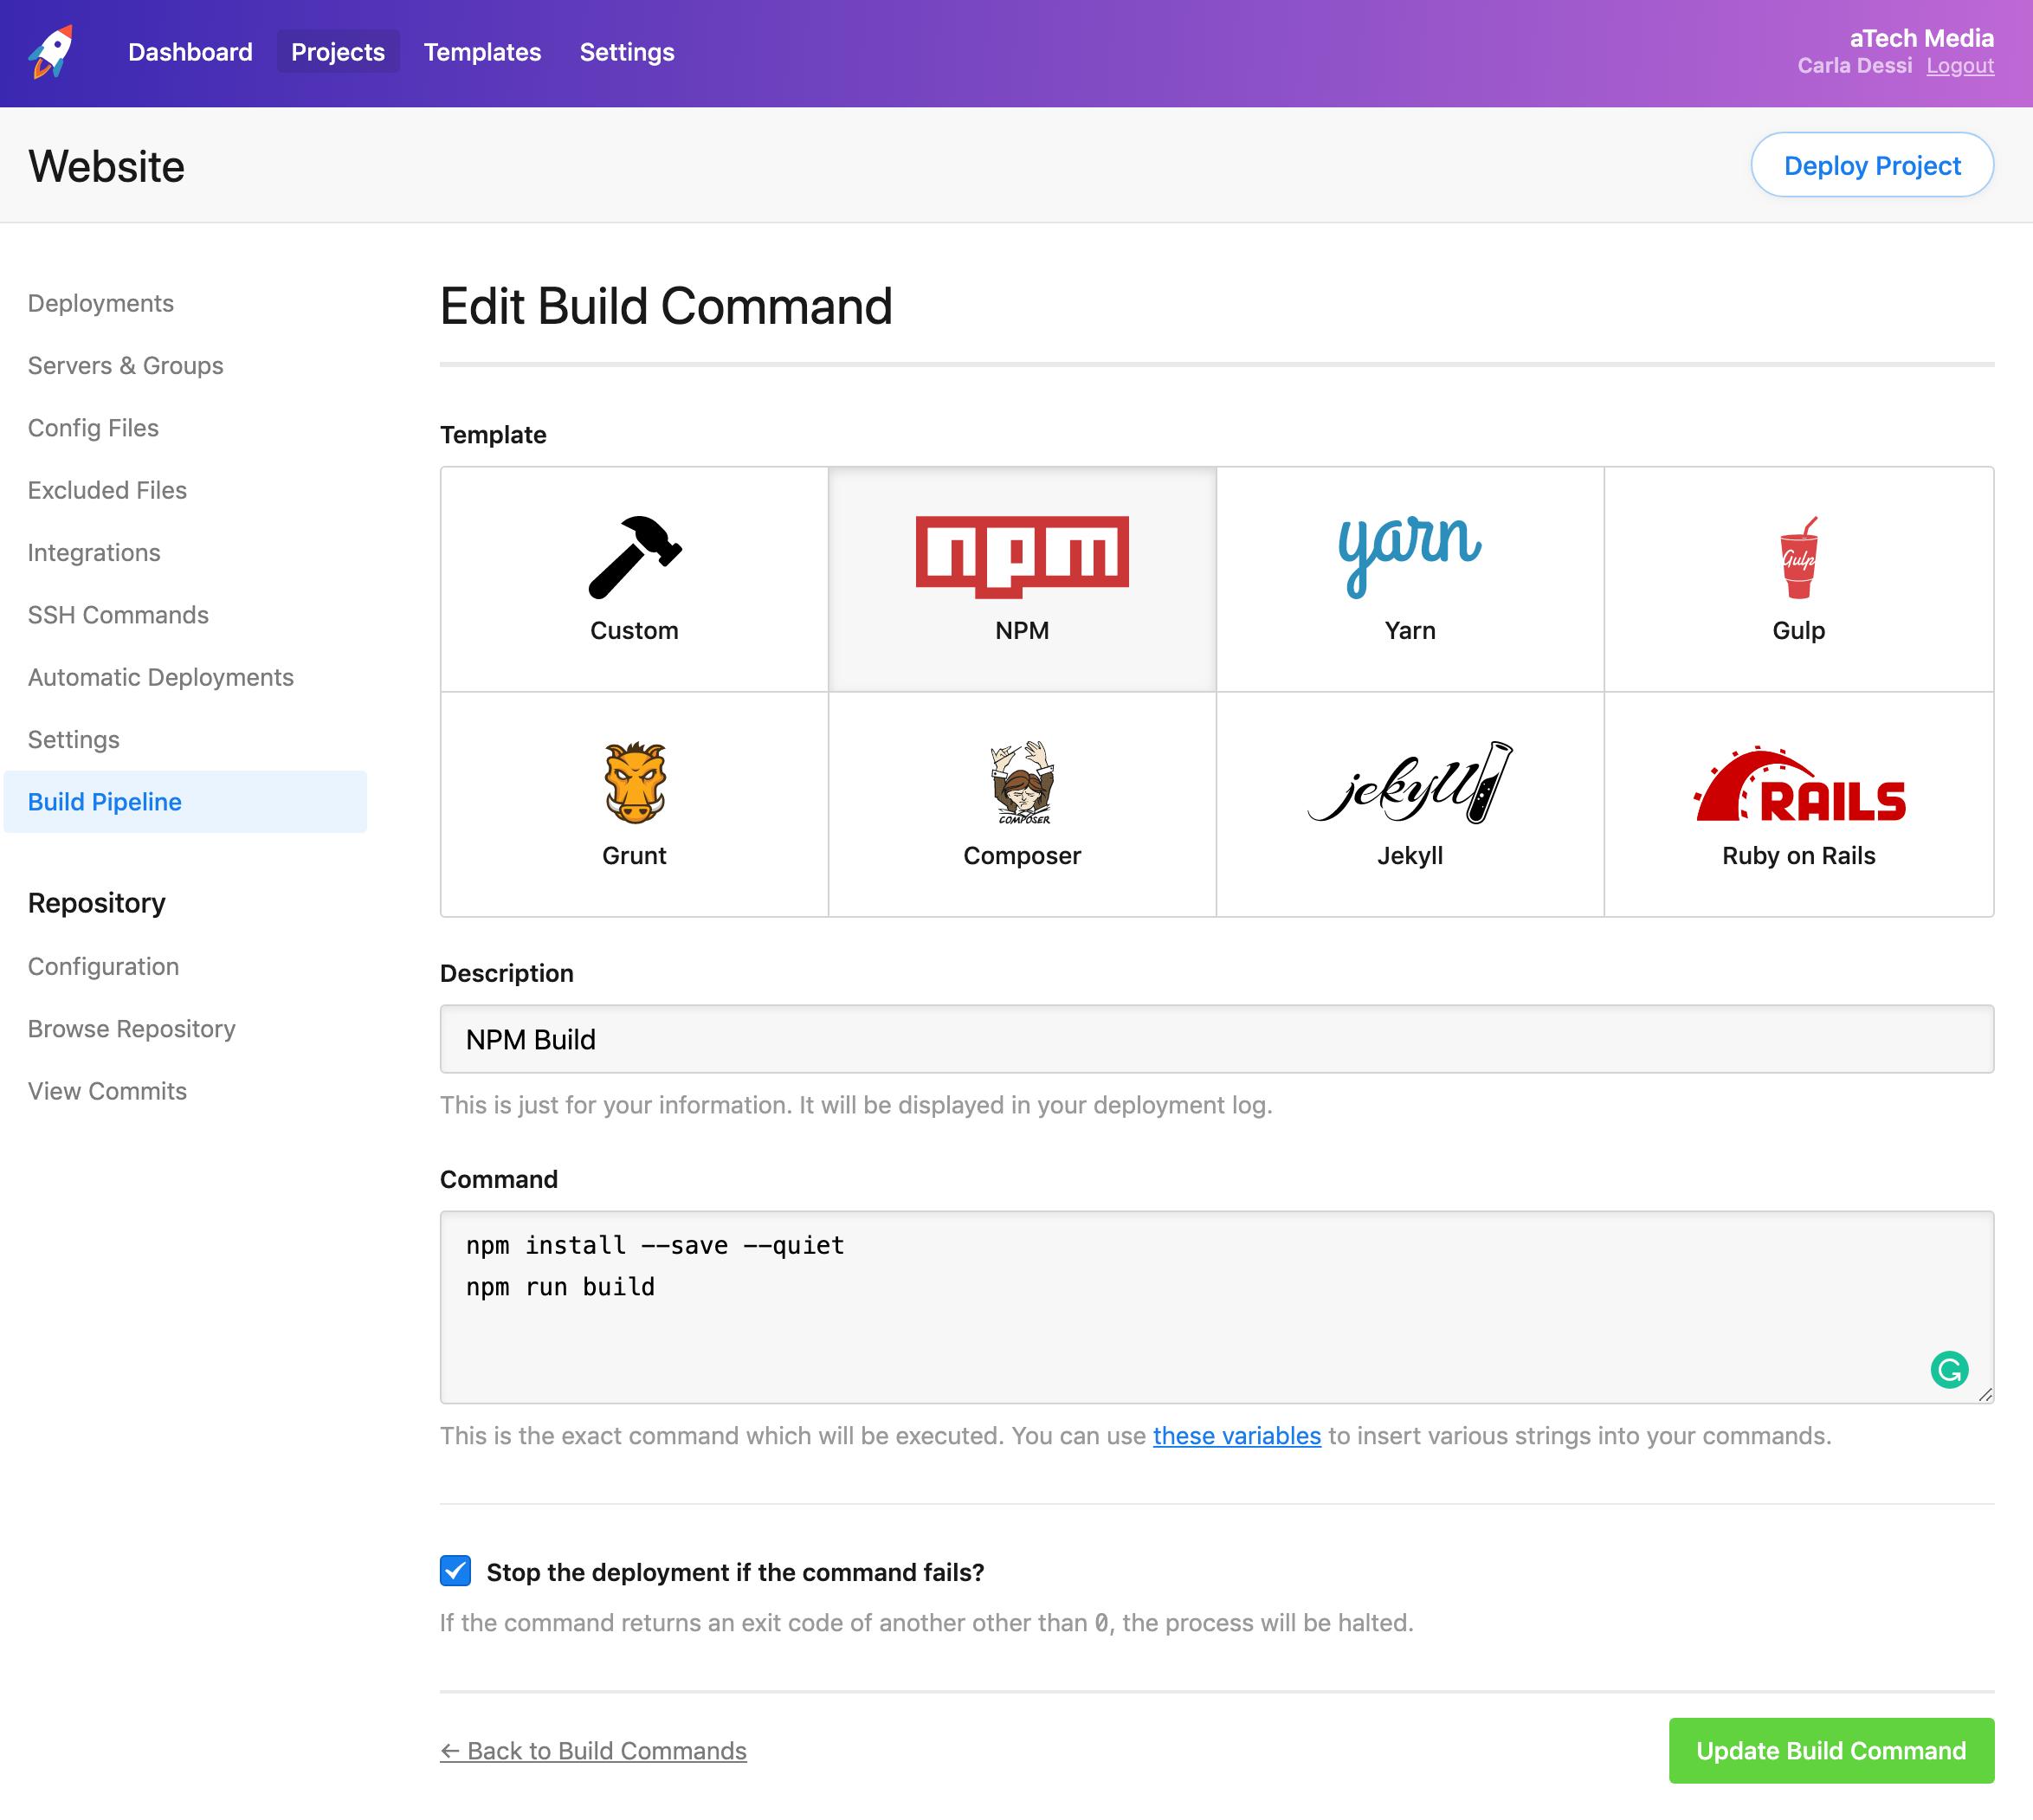 Build commands